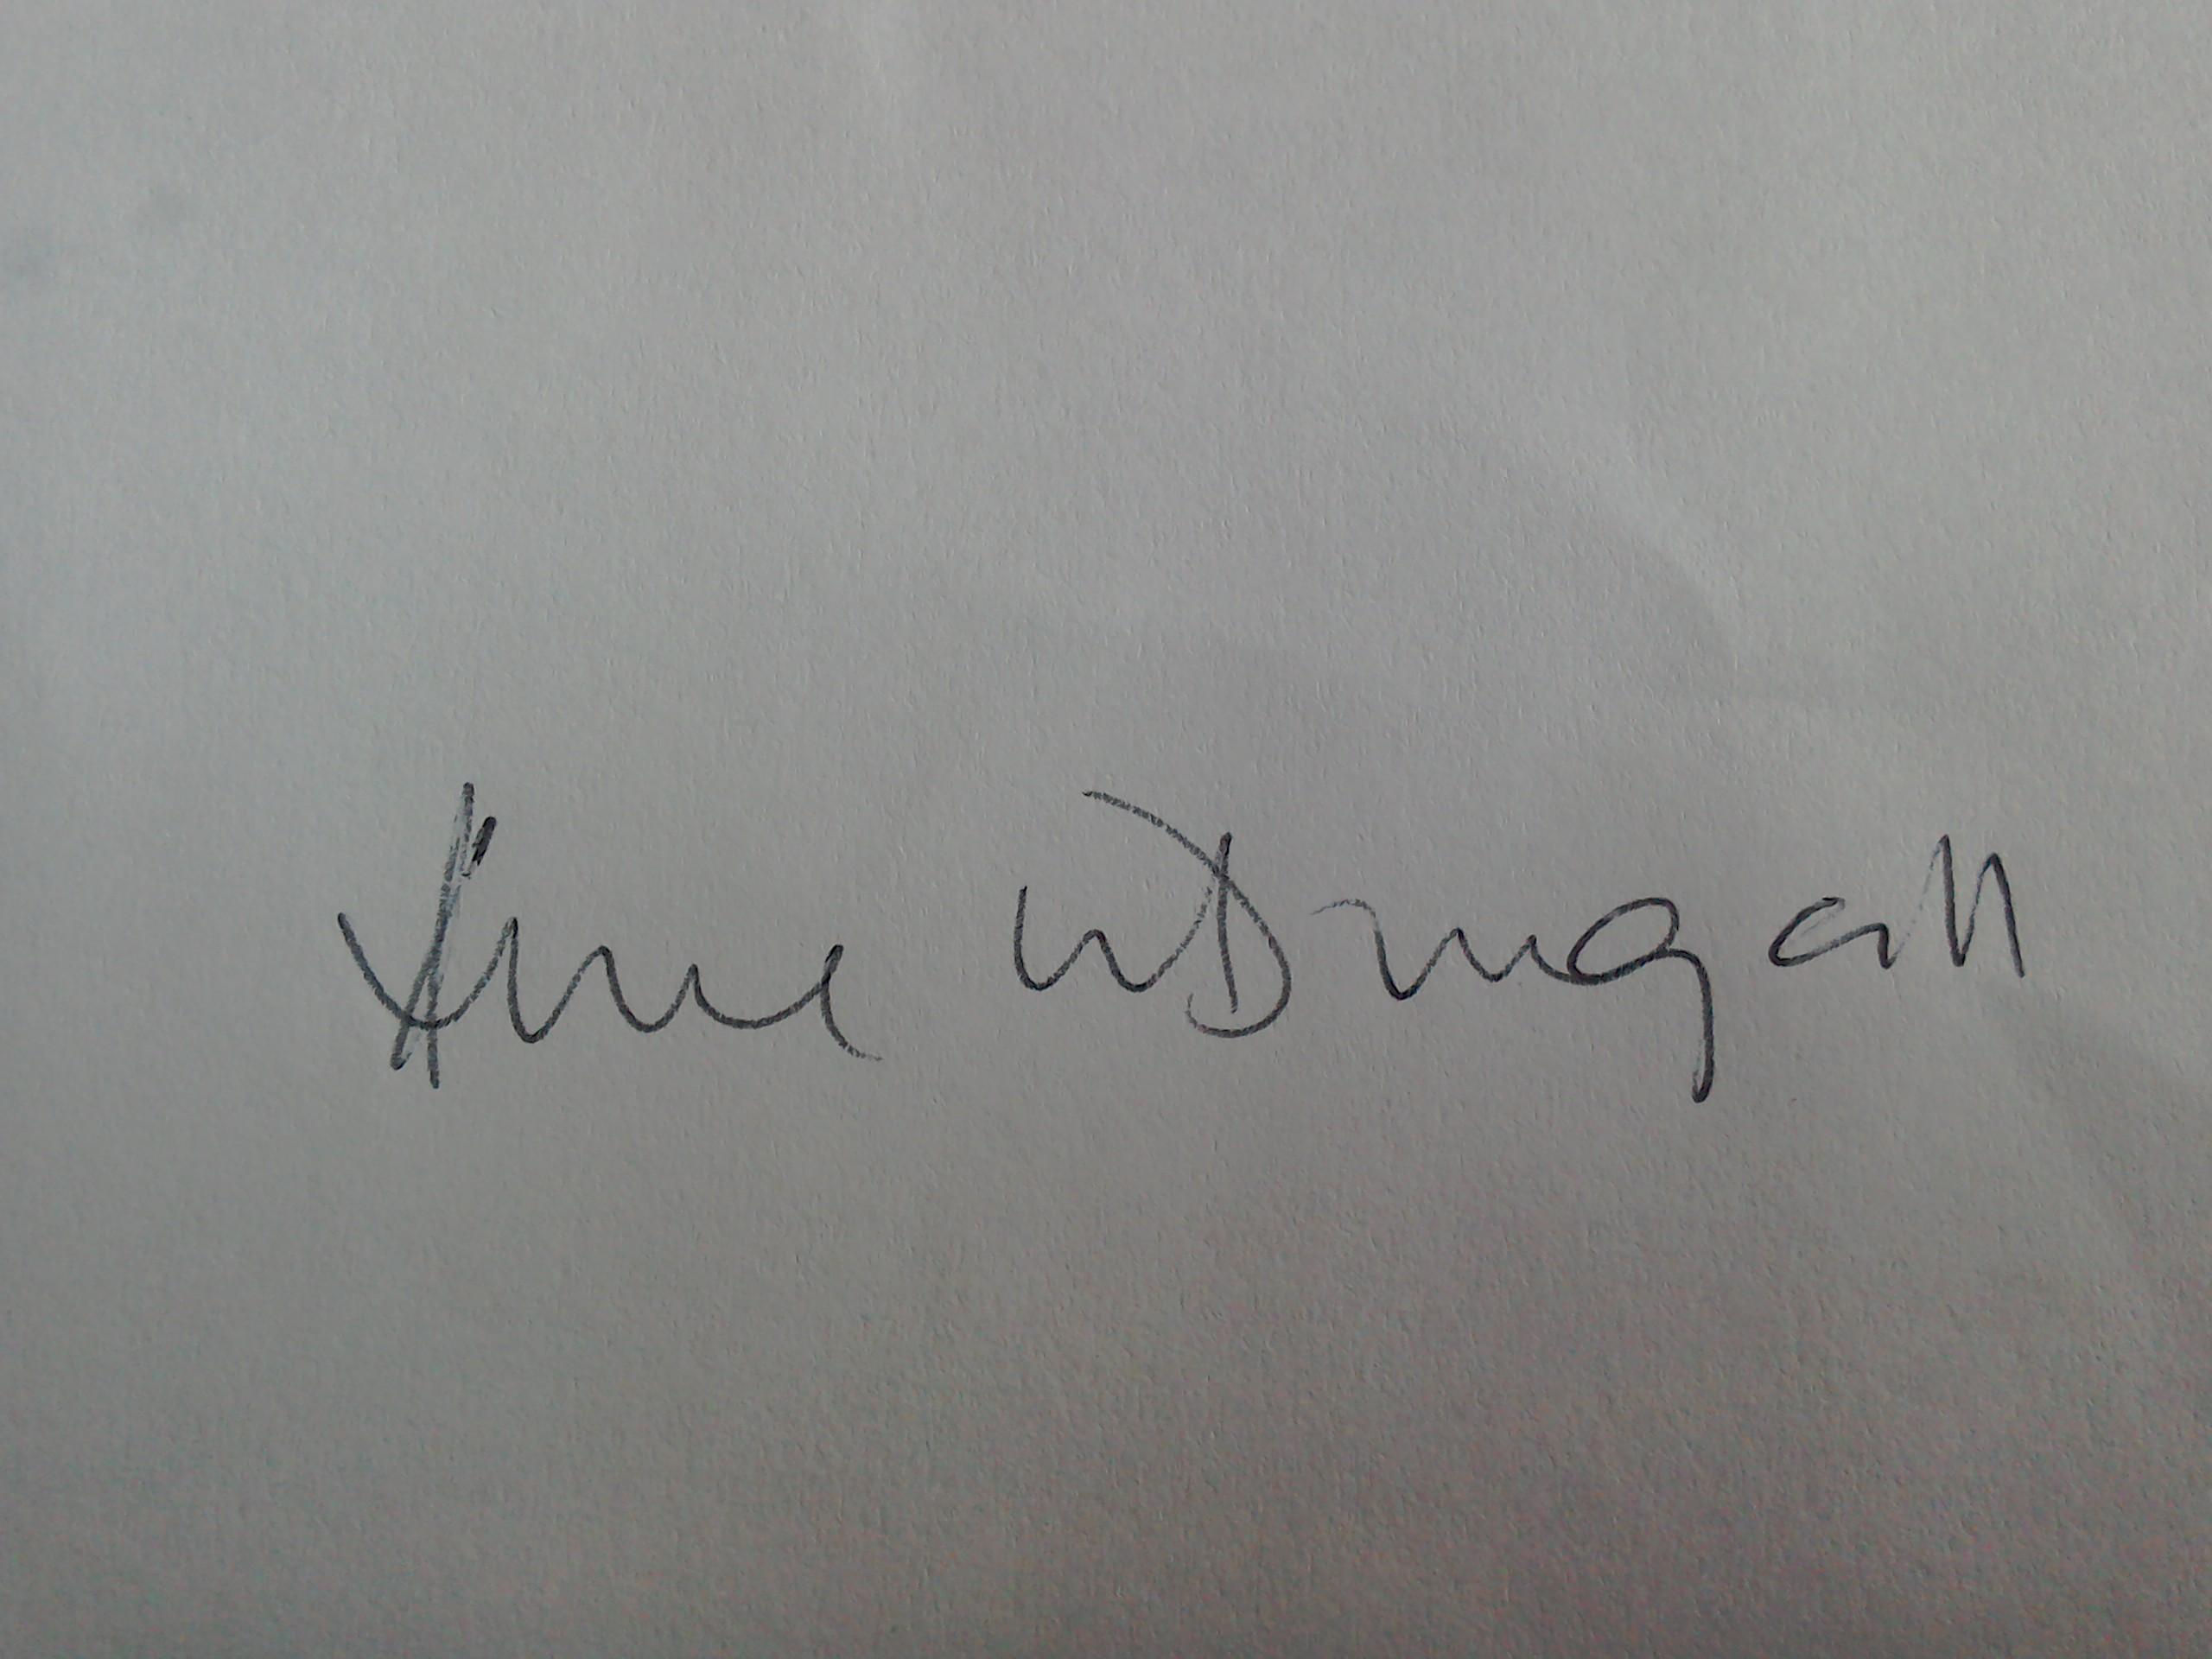 Anne Mcdougall's Signature